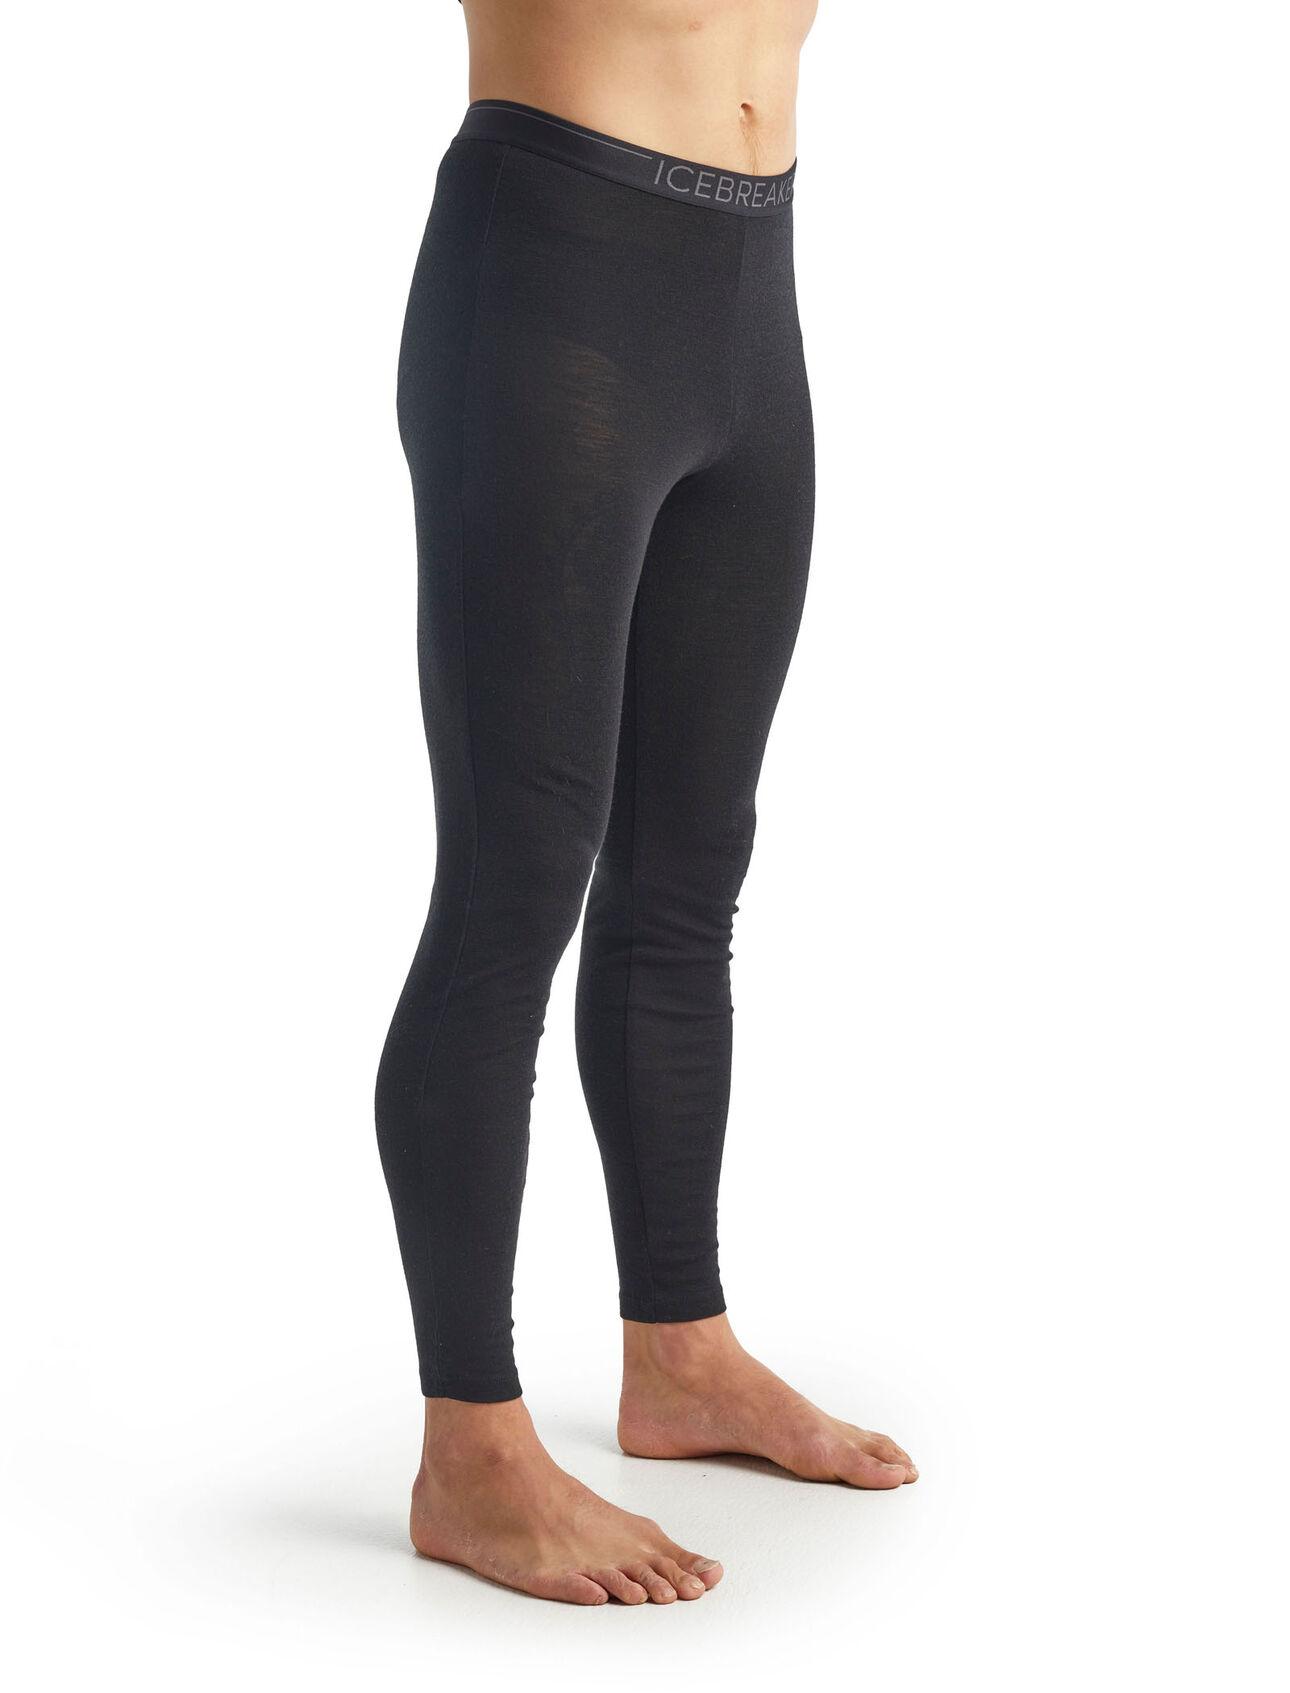 Merino 175 Everyday Thermal Leggings